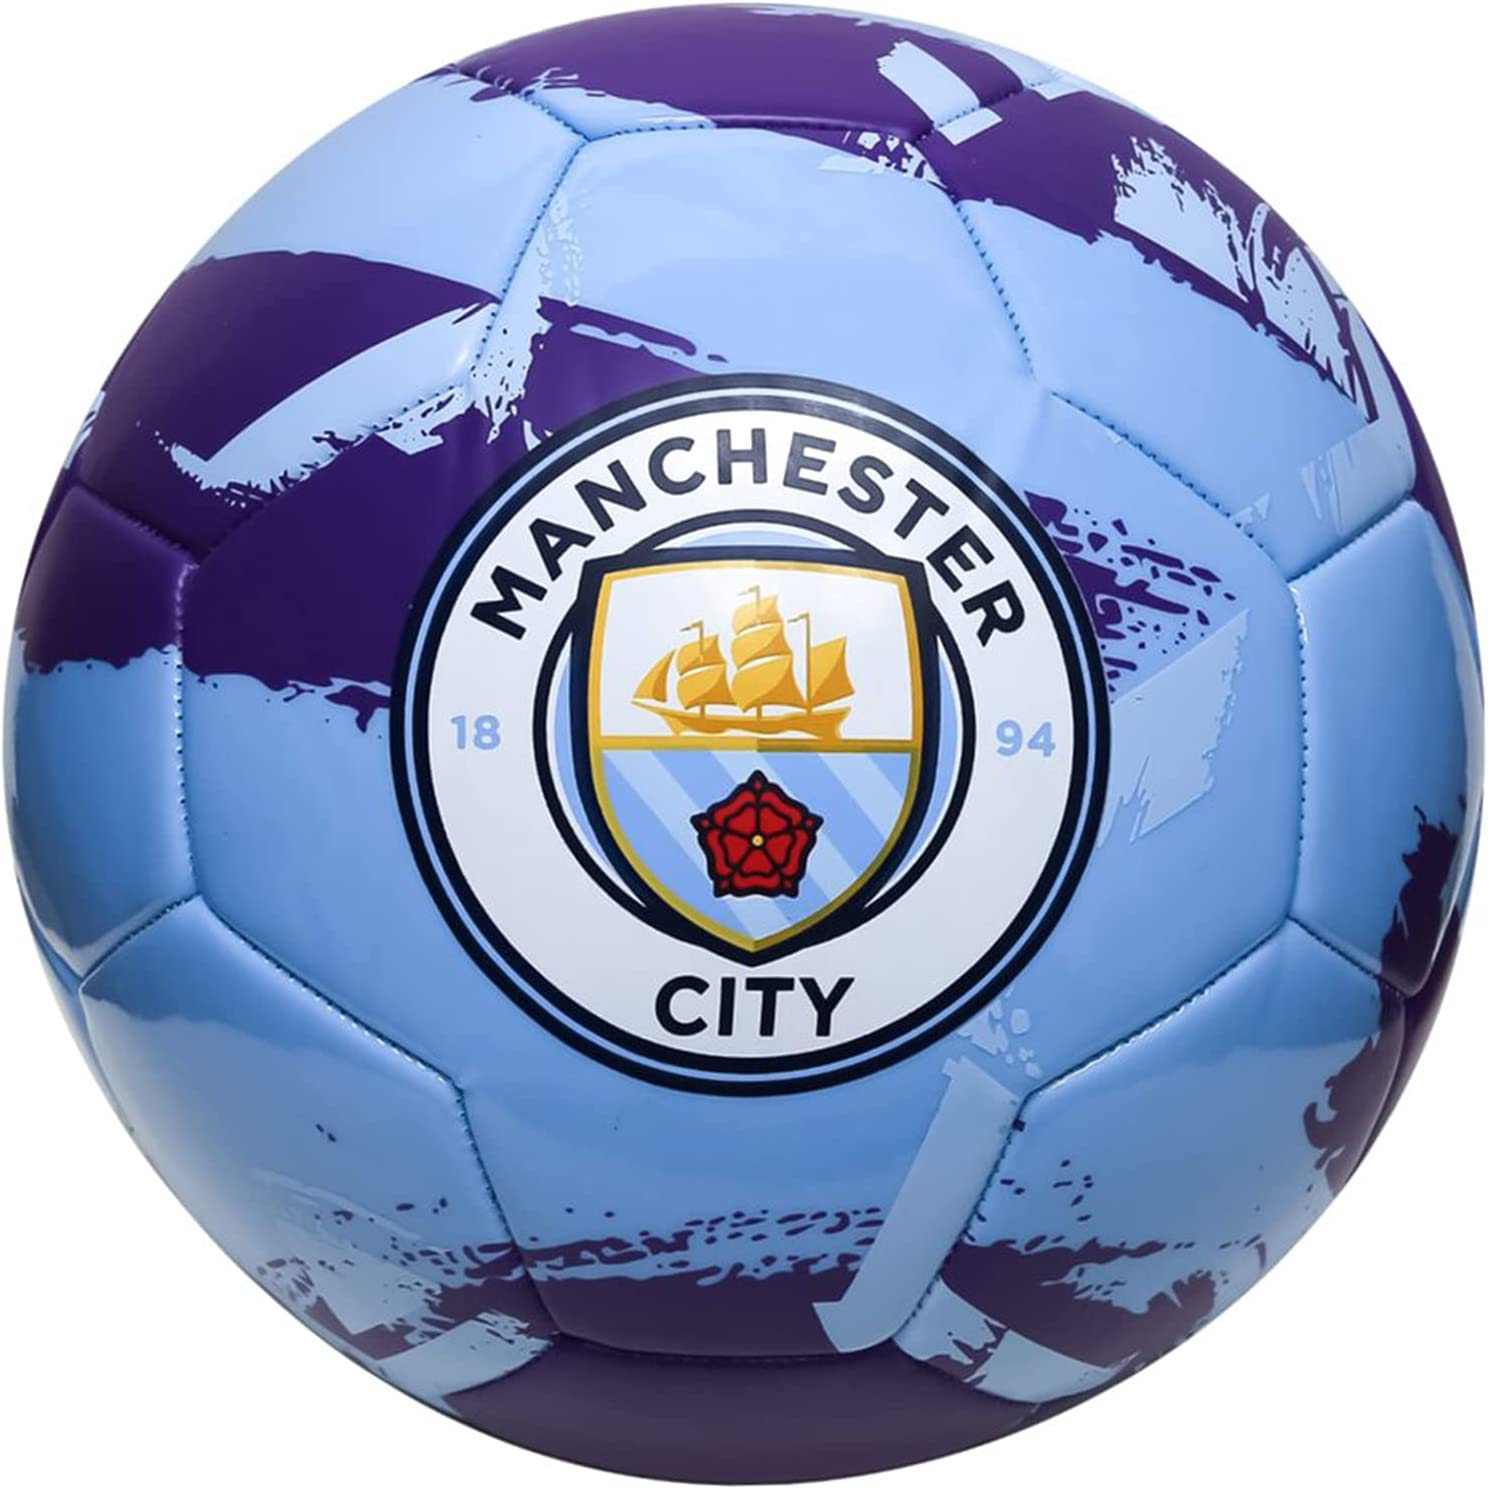 Soccer Club Balls Size 5 Games for Football Regular dealer 100% quality warranty Officially Licensed